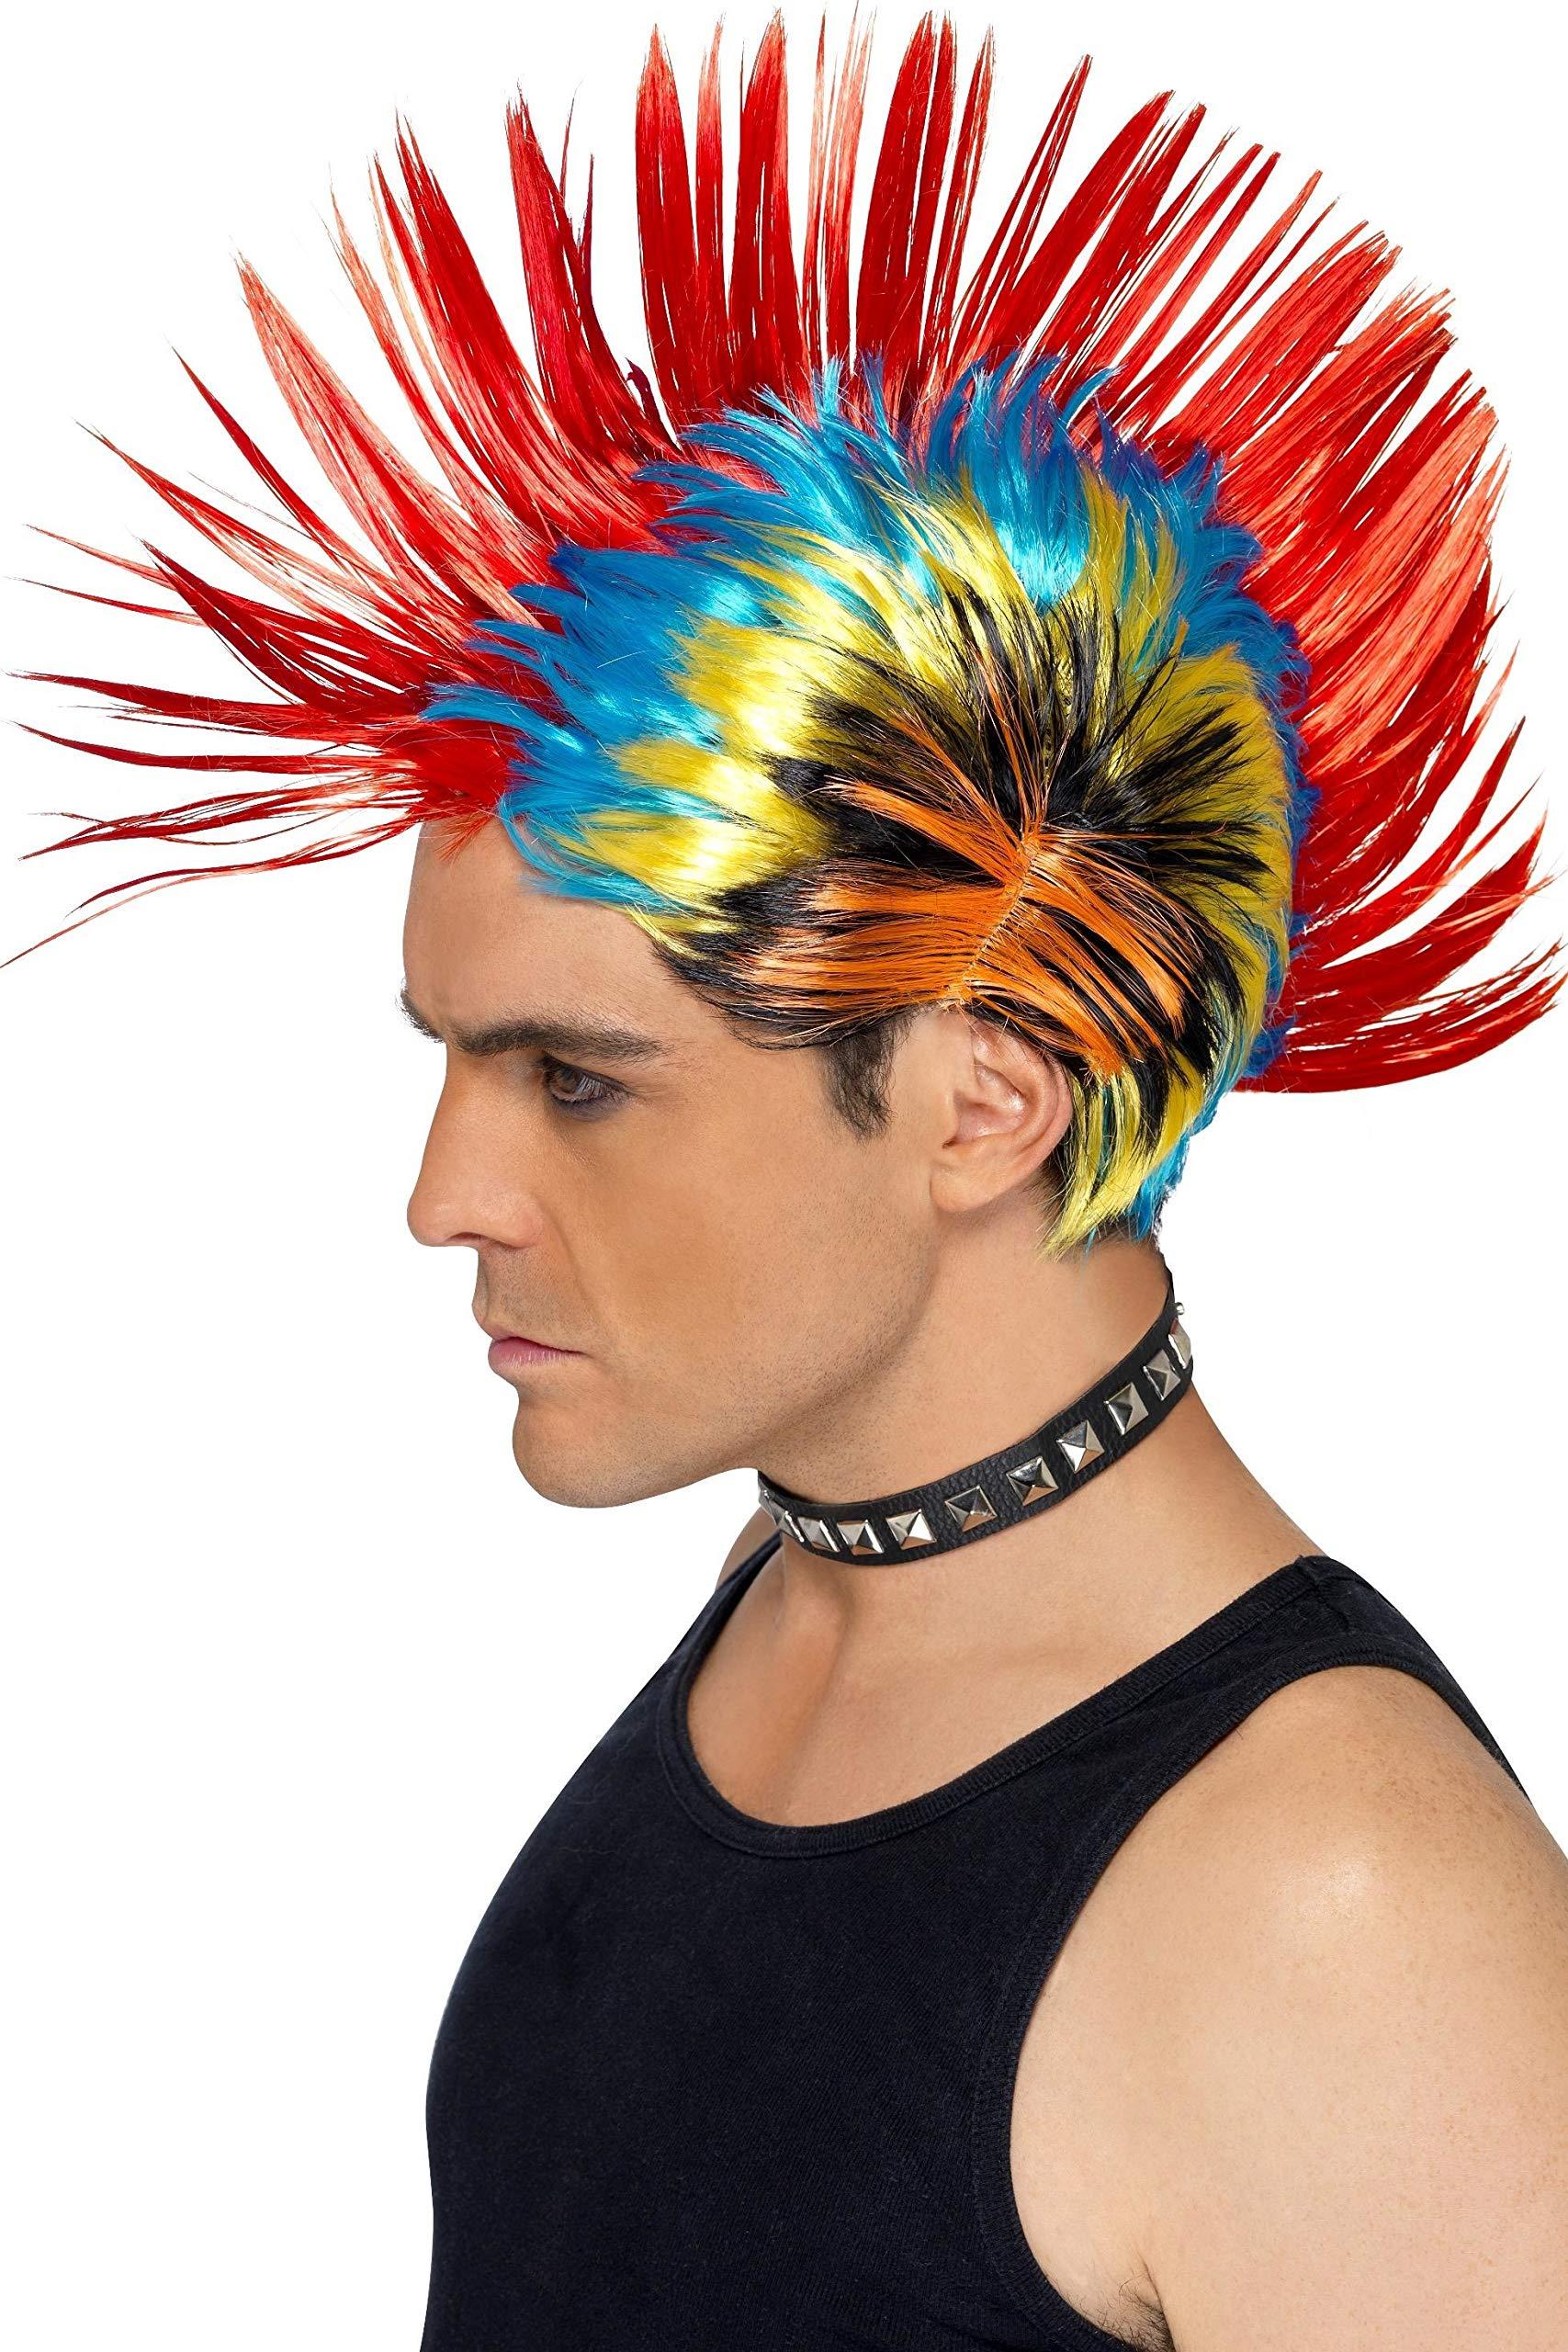 Party//Fancy Dress//Halloween Wig Mohawk 80ies Wave Glam Punk Black /& Blue WIG ME UP